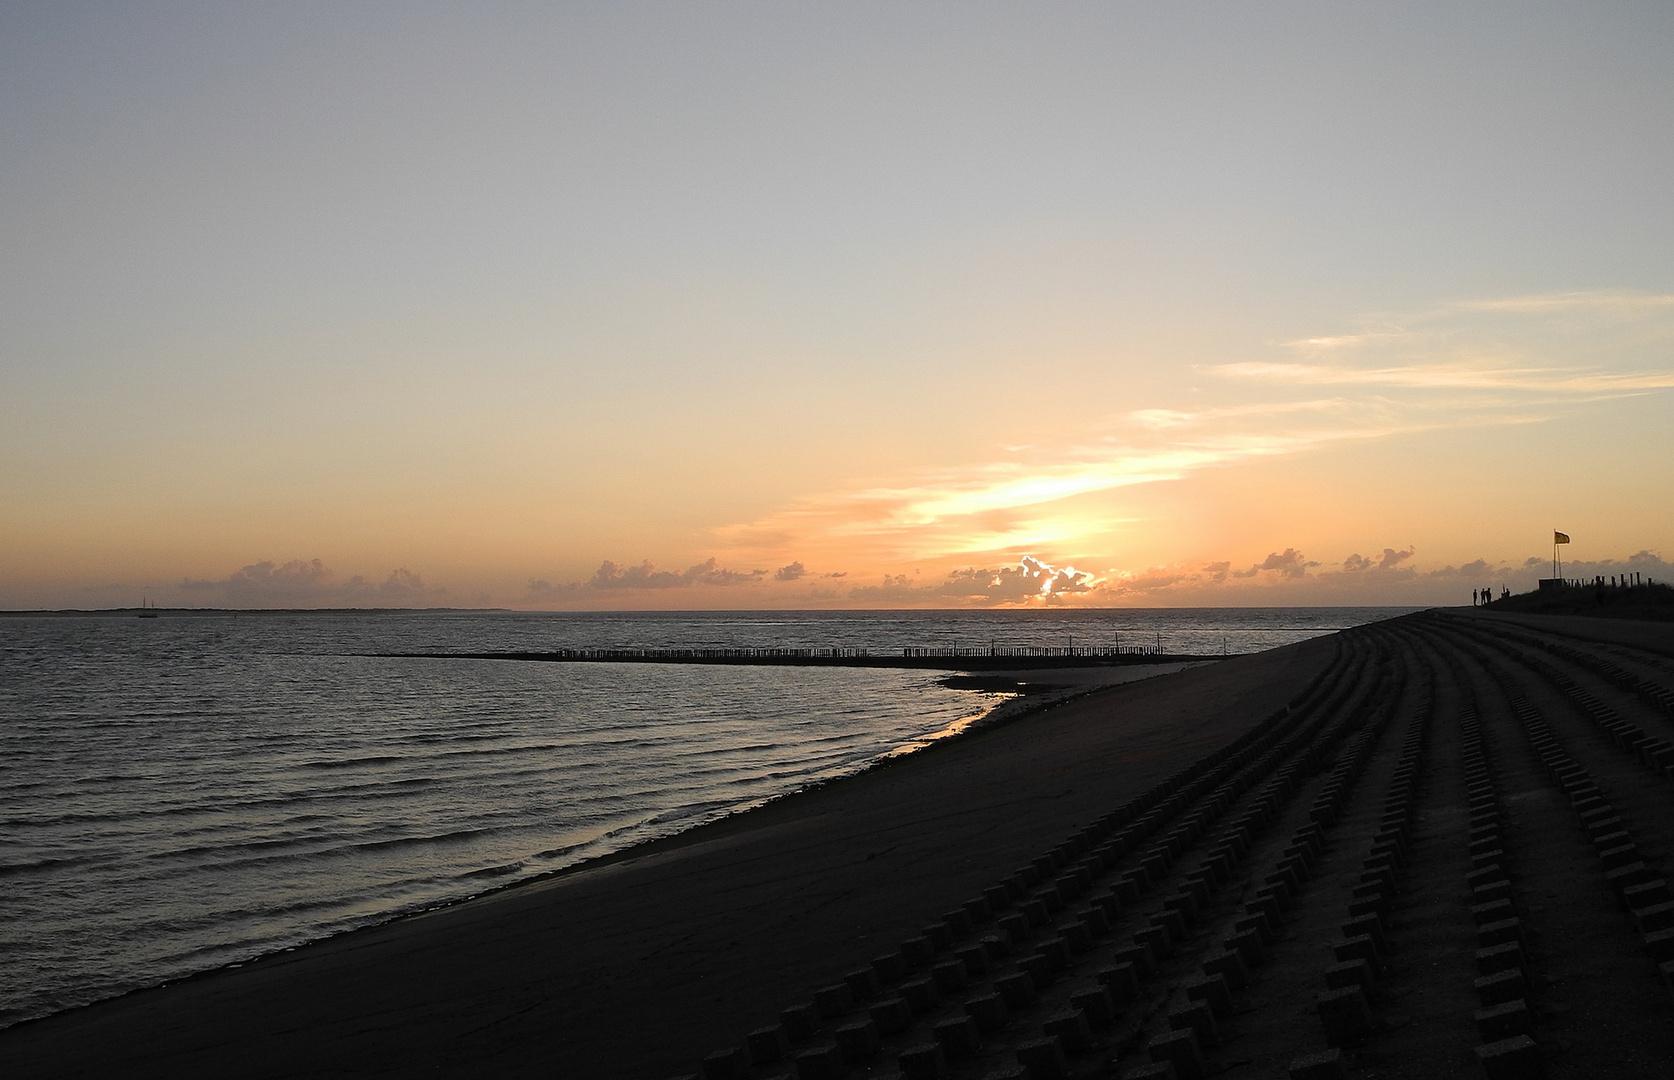 Sonnenuntergang Westen